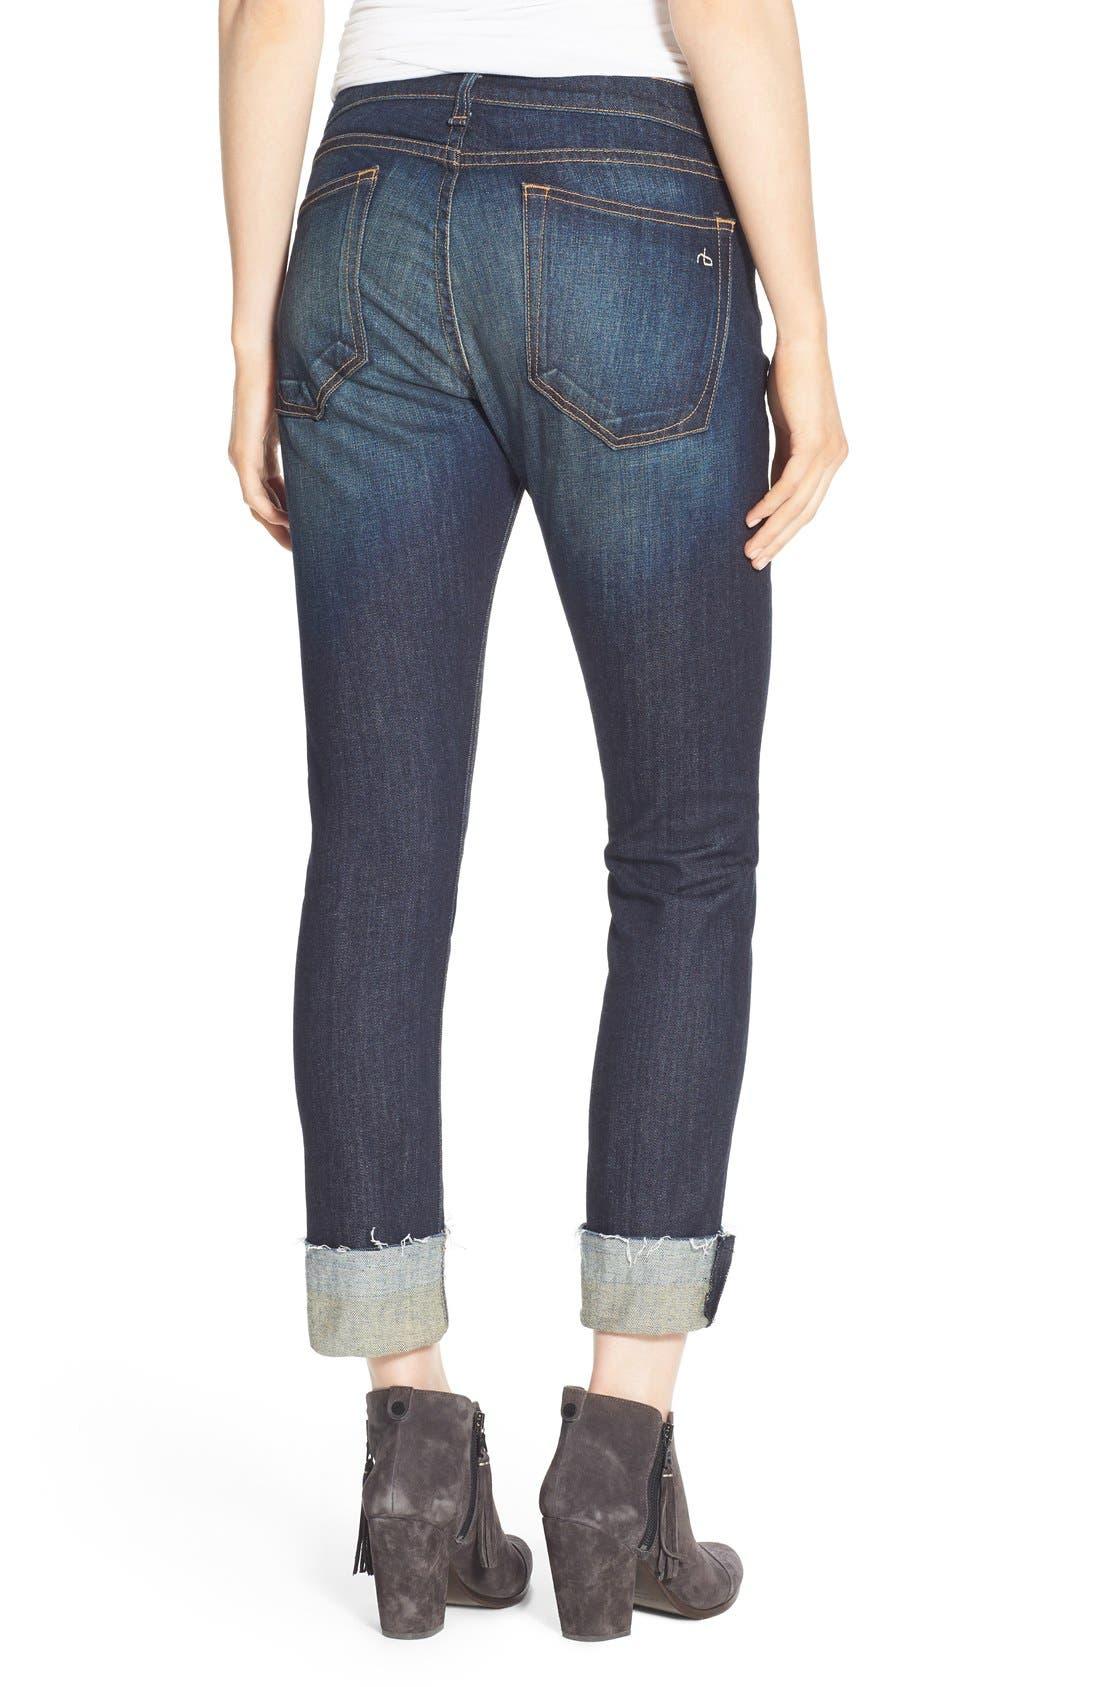 Alternate Image 3  - rag & bone/JEAN 'The Dre' Slim Fit Boyfriend Jeans (Yesler)